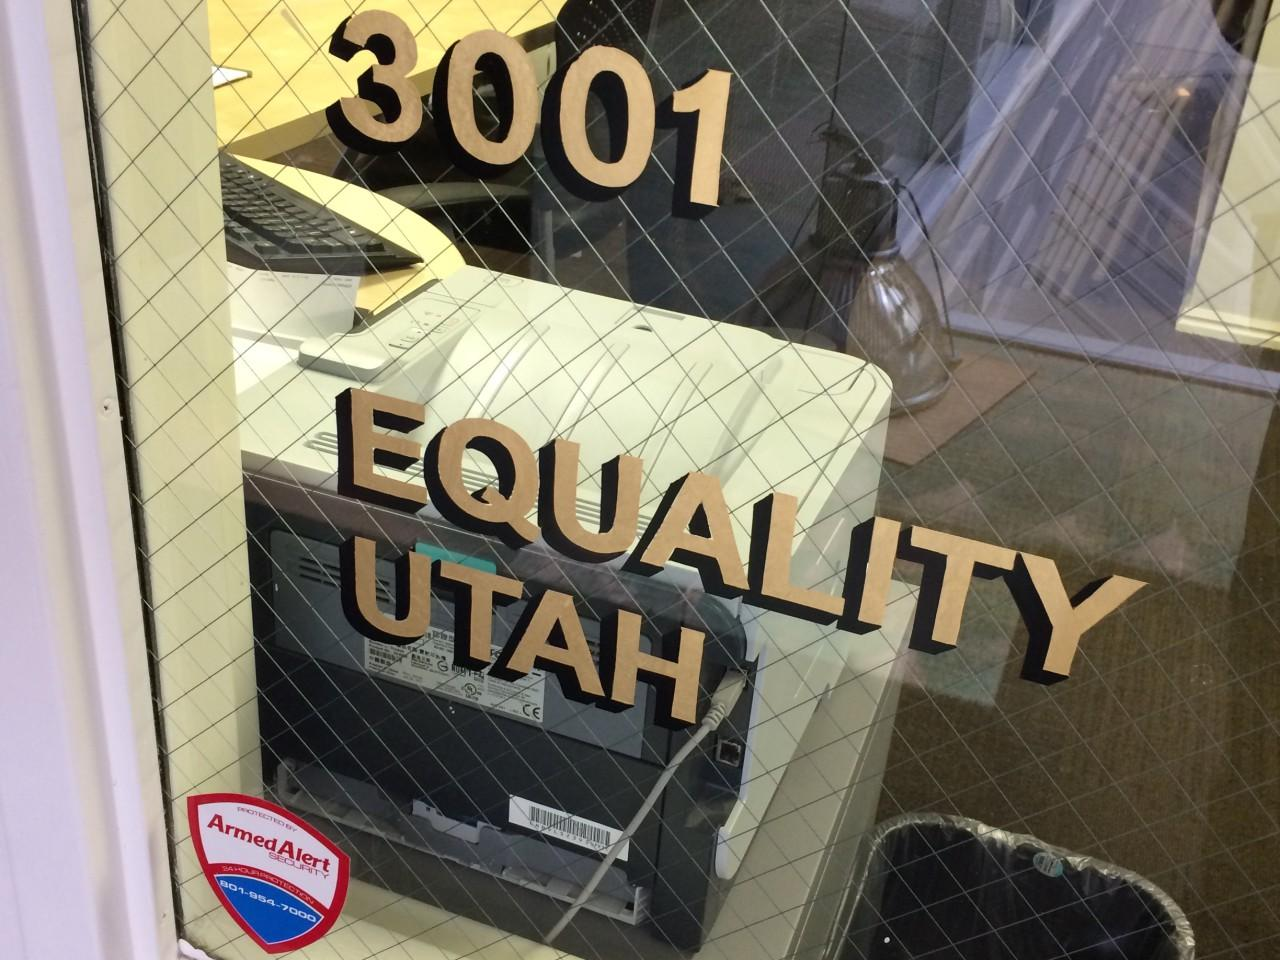 utah gay rights organizations jpg 853x1280